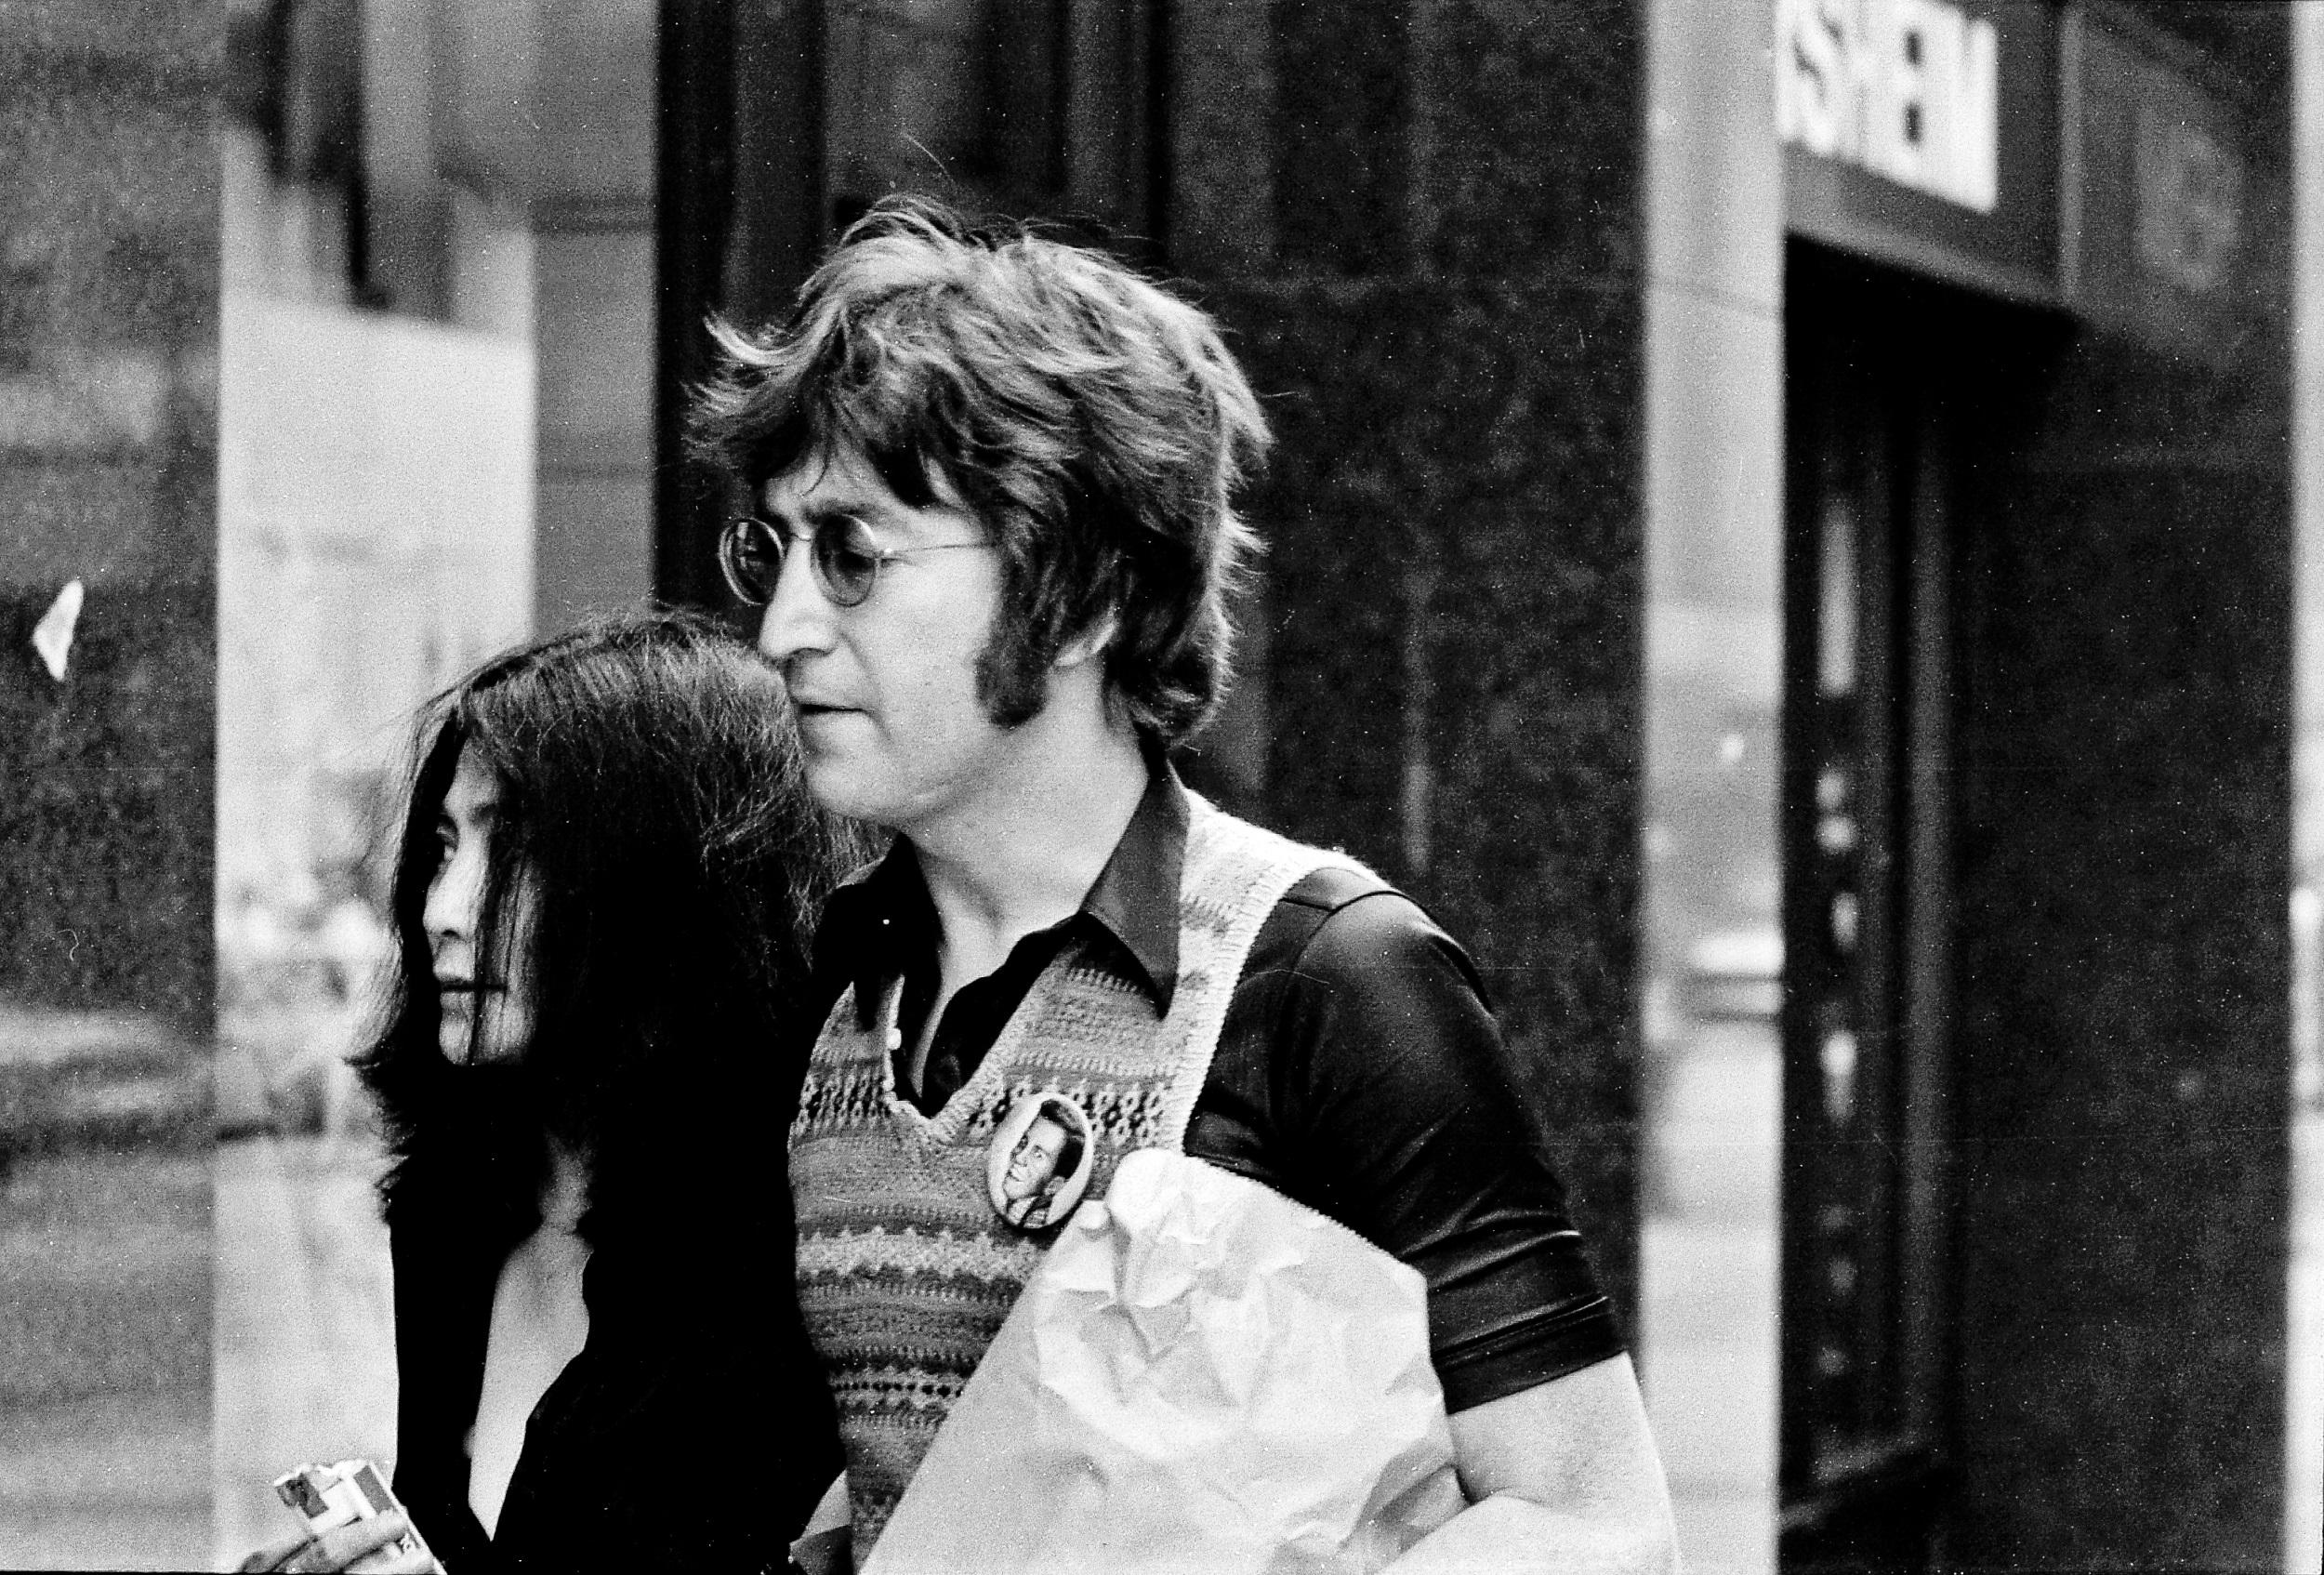 John Lennon Muhammad Ali And The 1970s Jeff Rothstein Takes Us